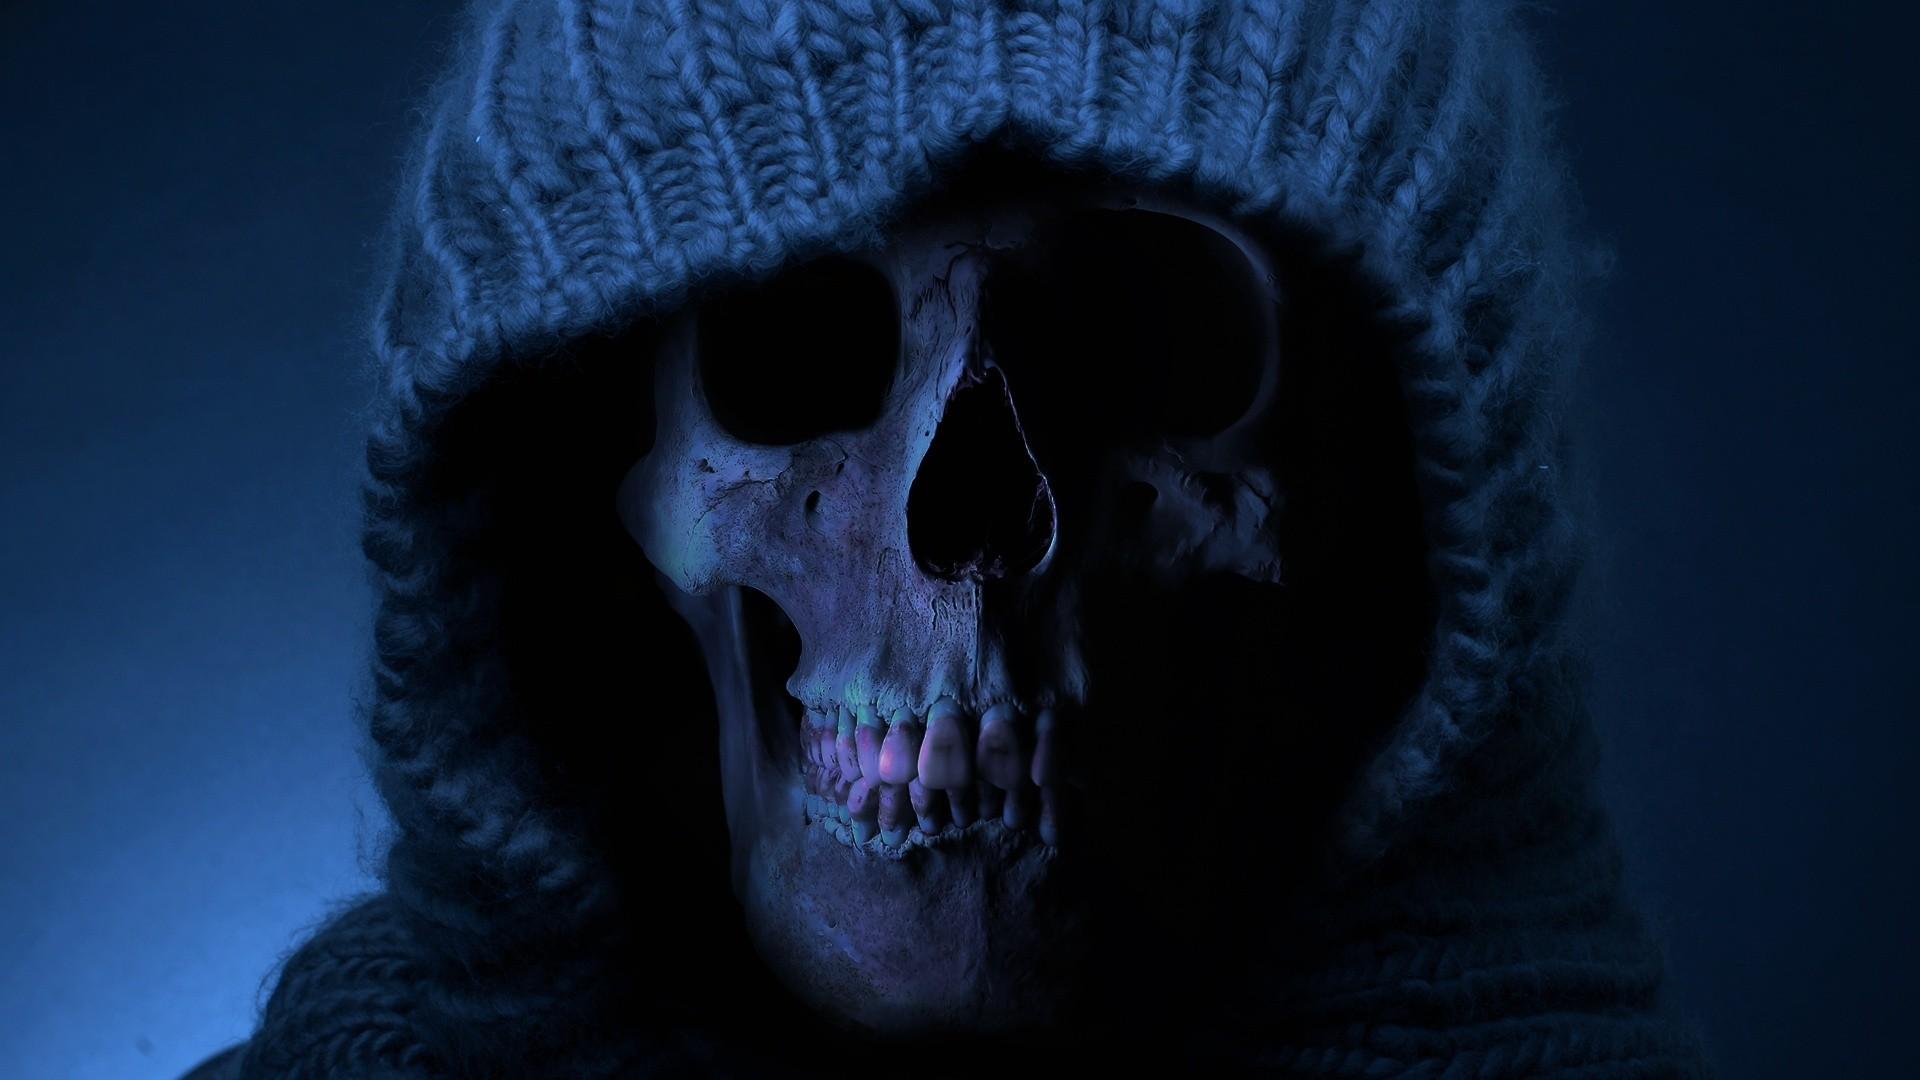 Death Skull HD Wallpapersjpg 1920x1080